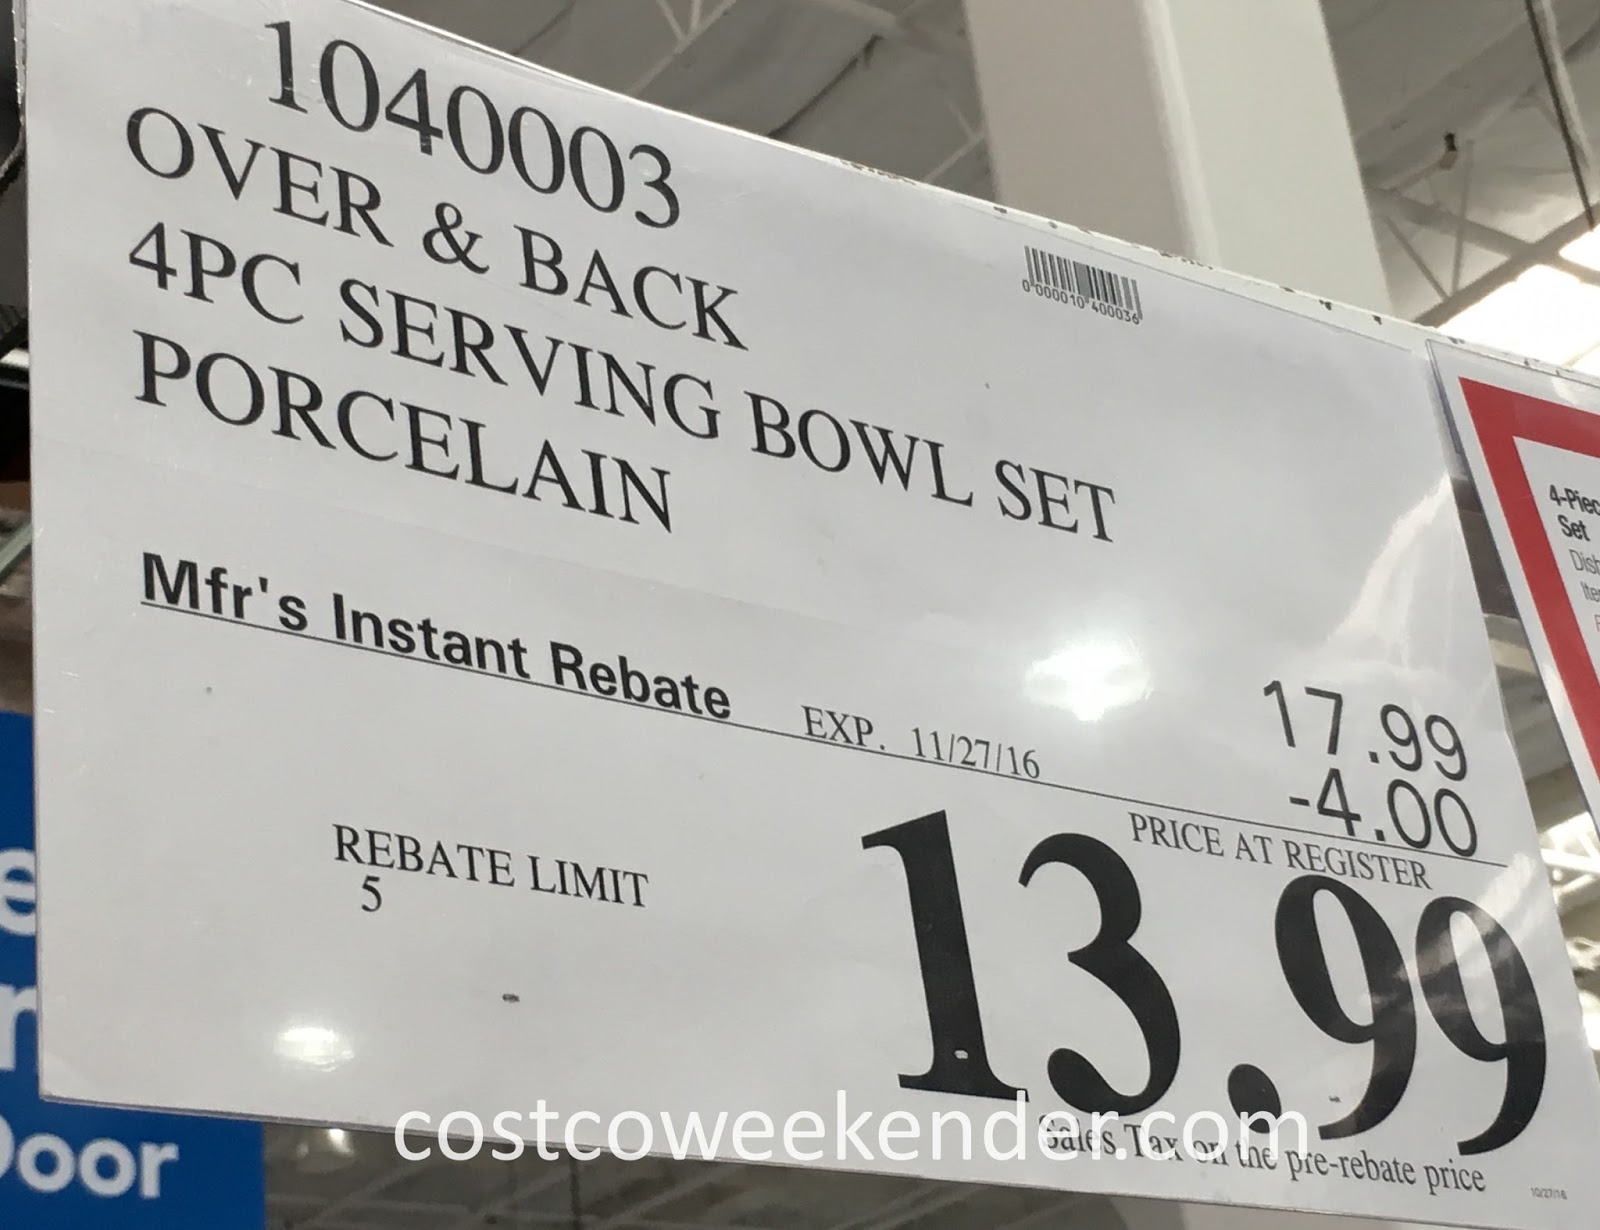 overandback Porcelain Serving Bowl Set (4 pieces) | Costco Weekender